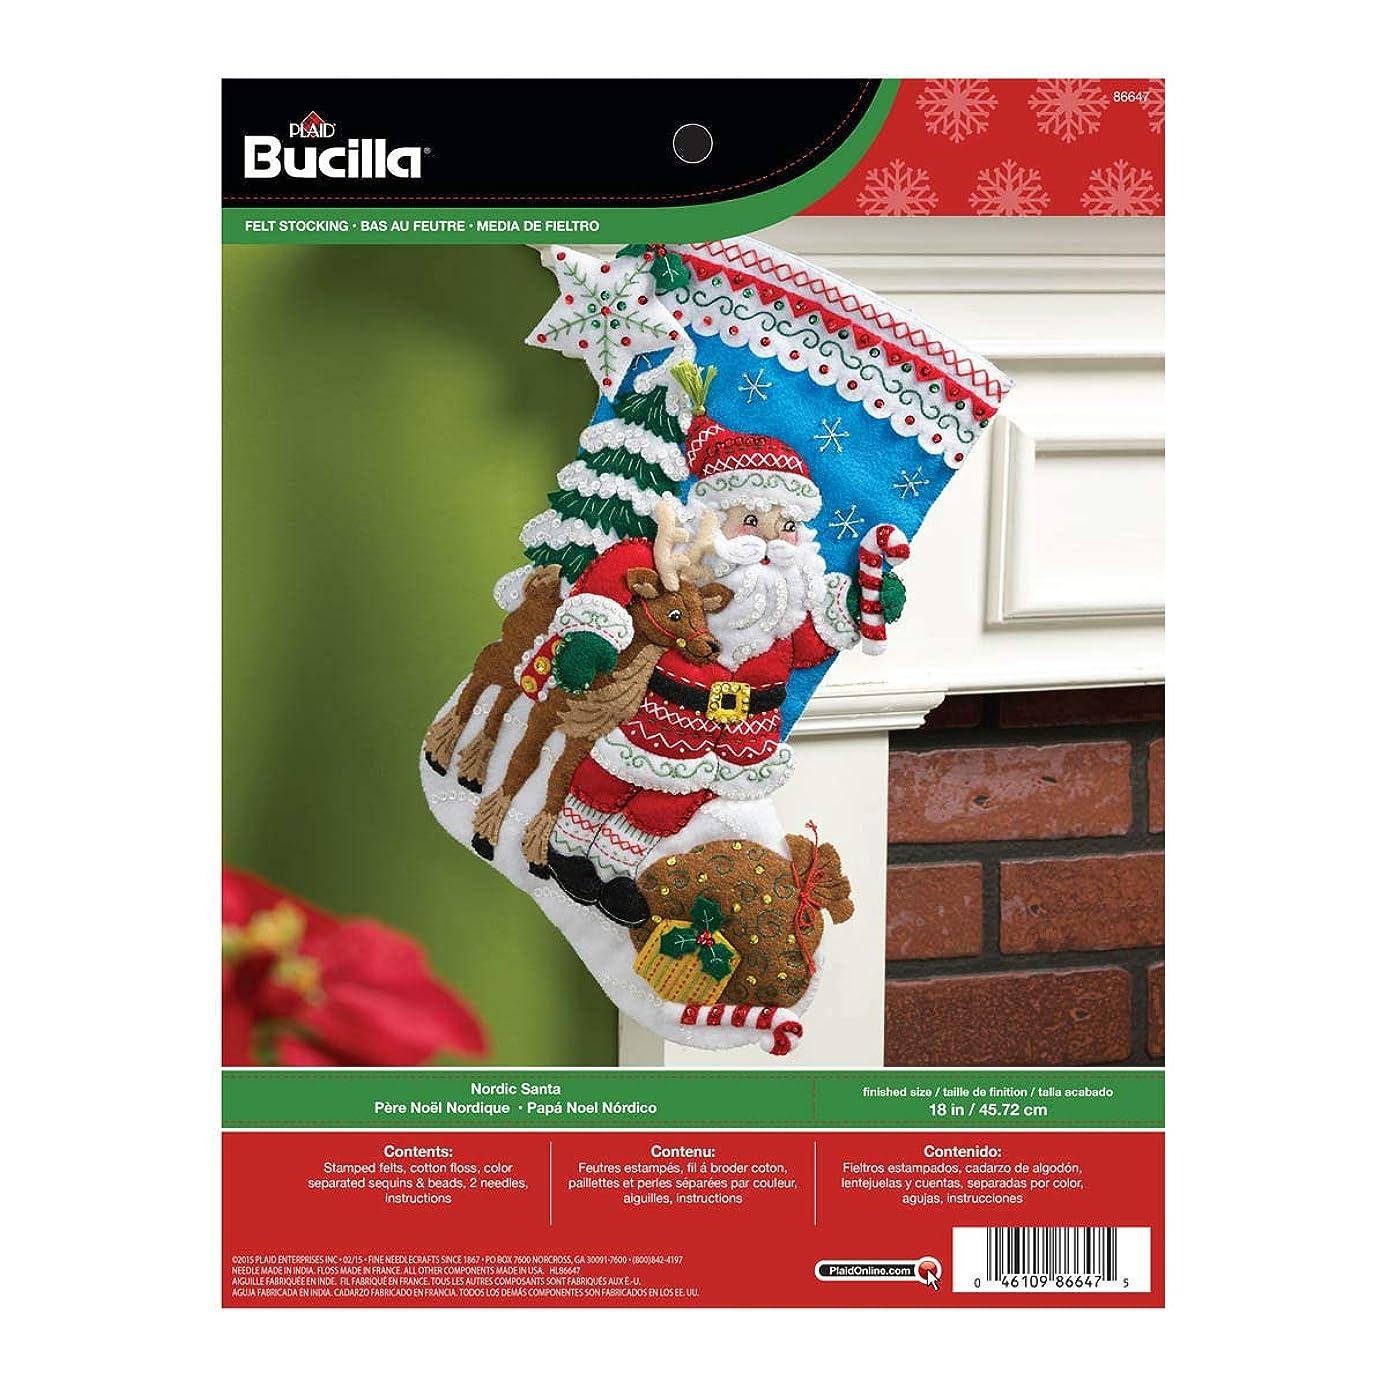 Bucilla 18-Inch Christmas Stocking Felt Applique Kit, 86647 Nordic Santa